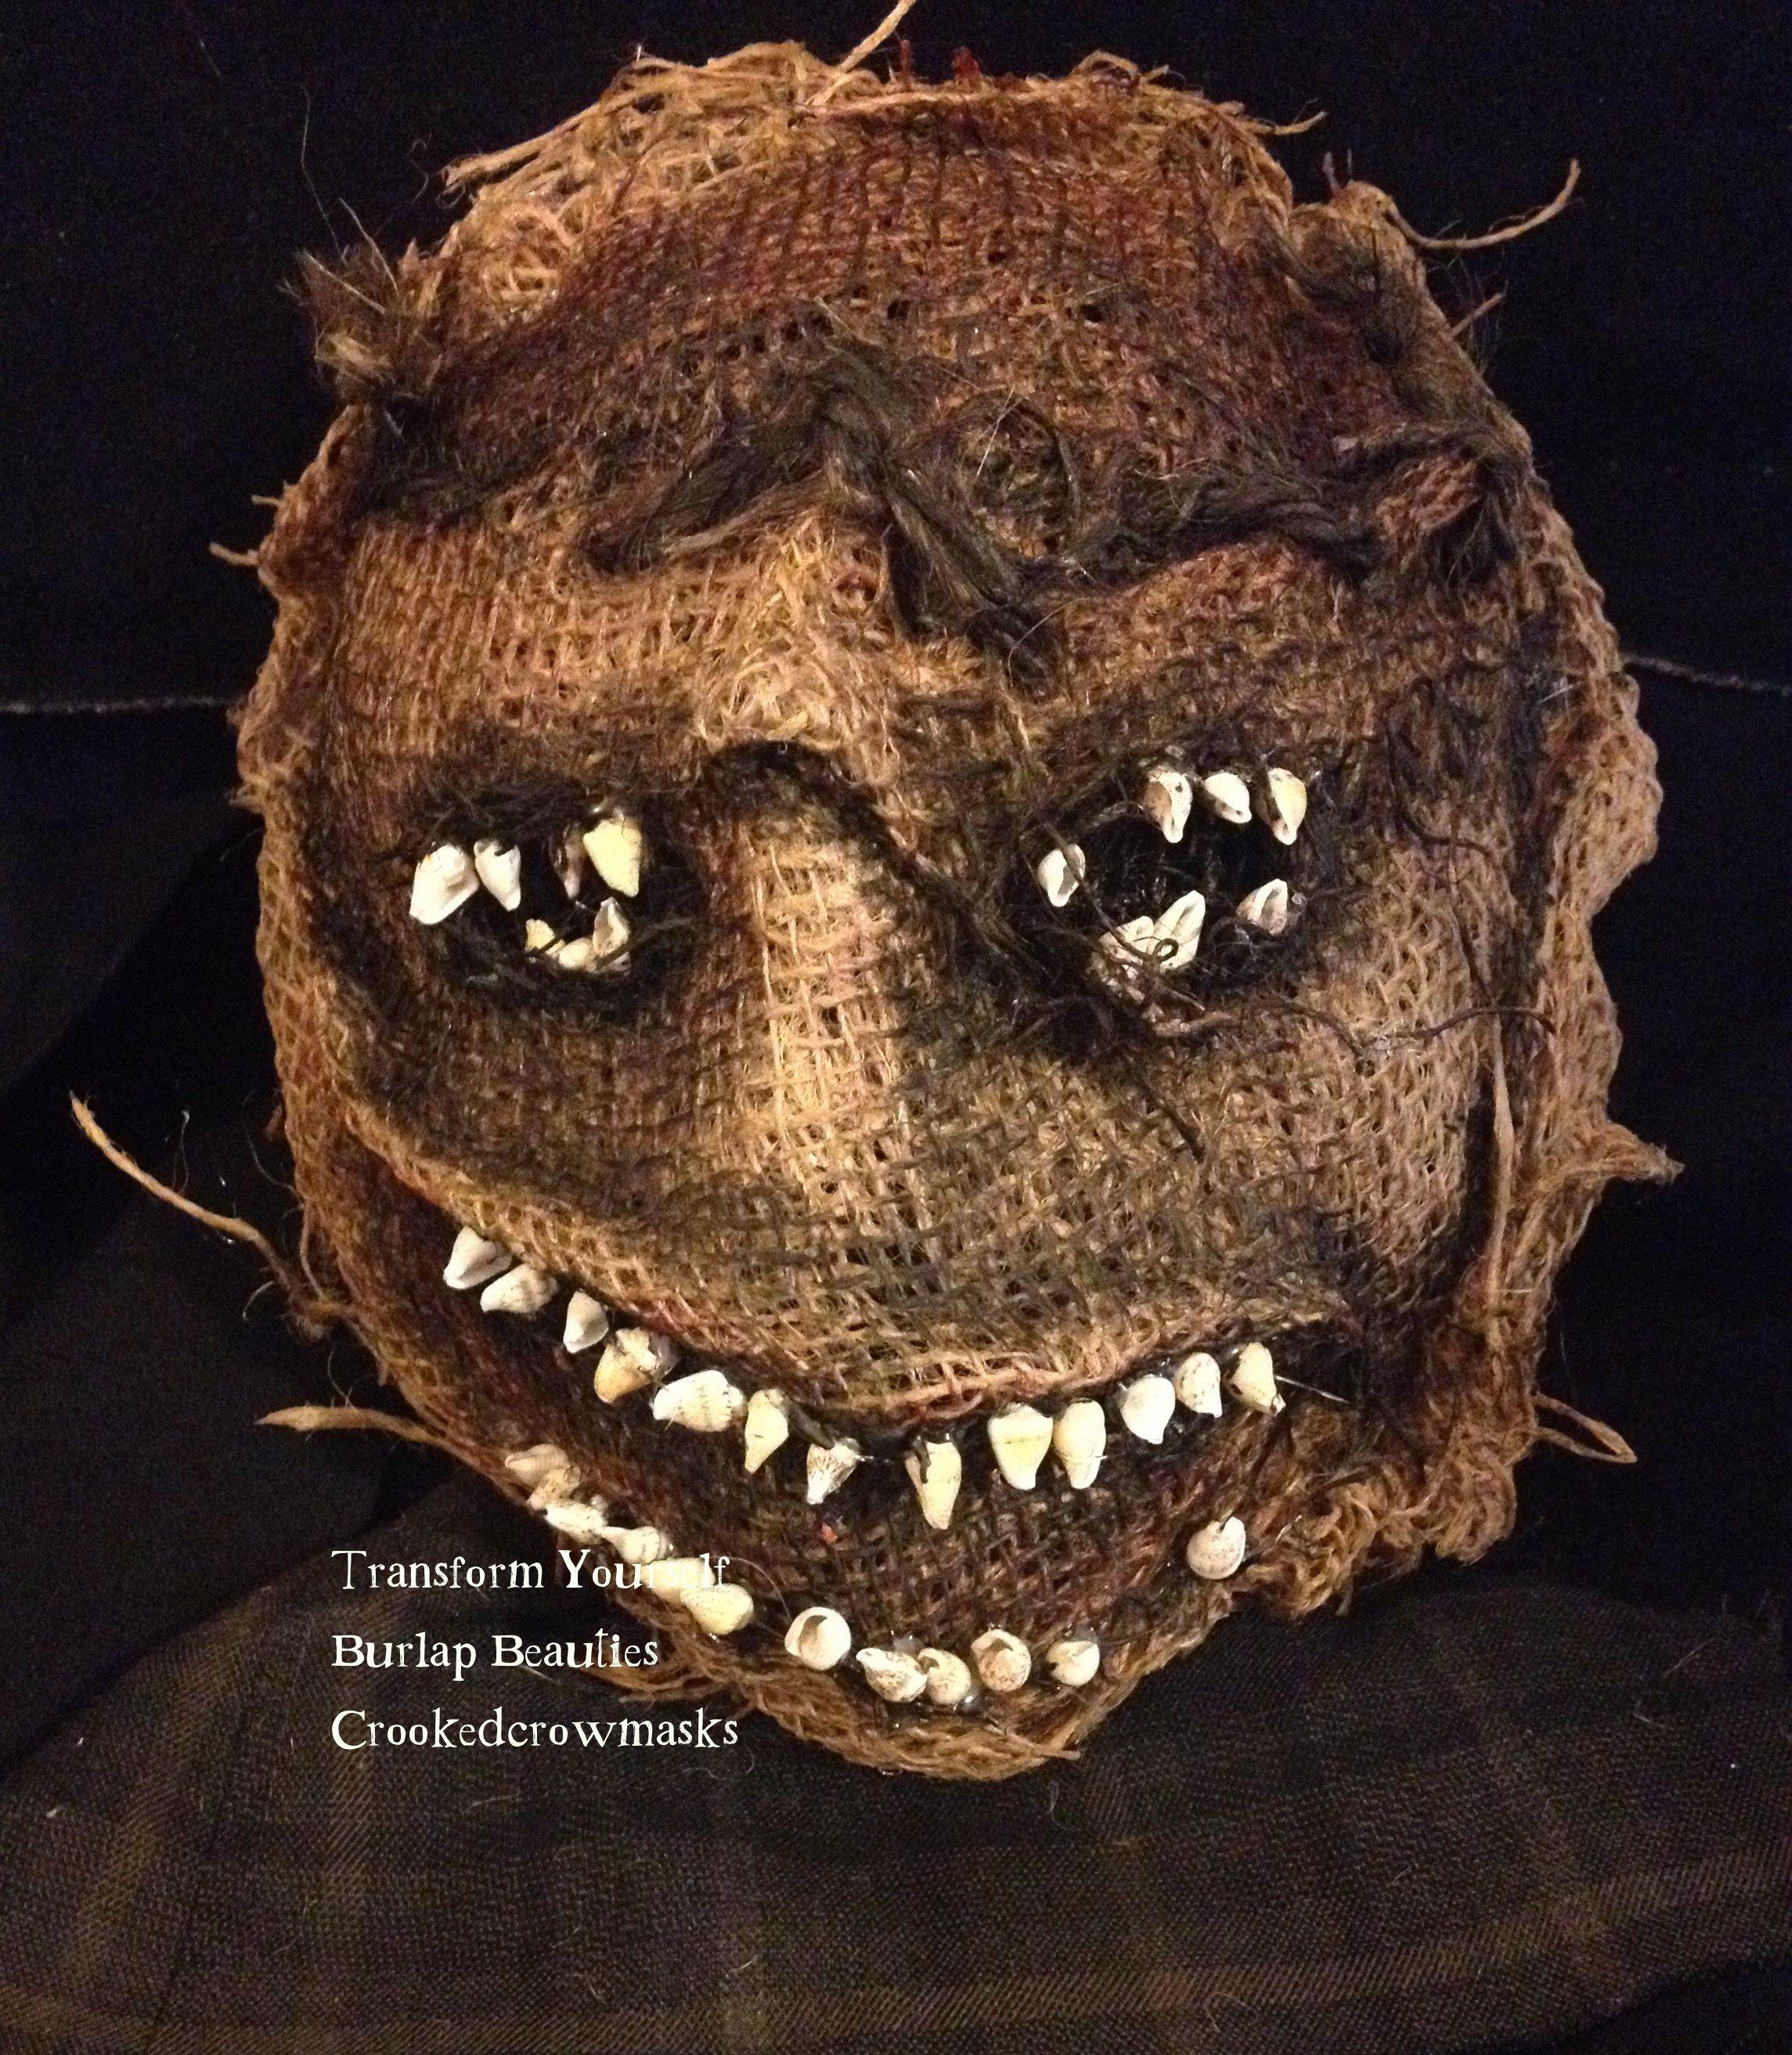 Creepy Mask Burlap Beauties Caras pintadas, Monstruos